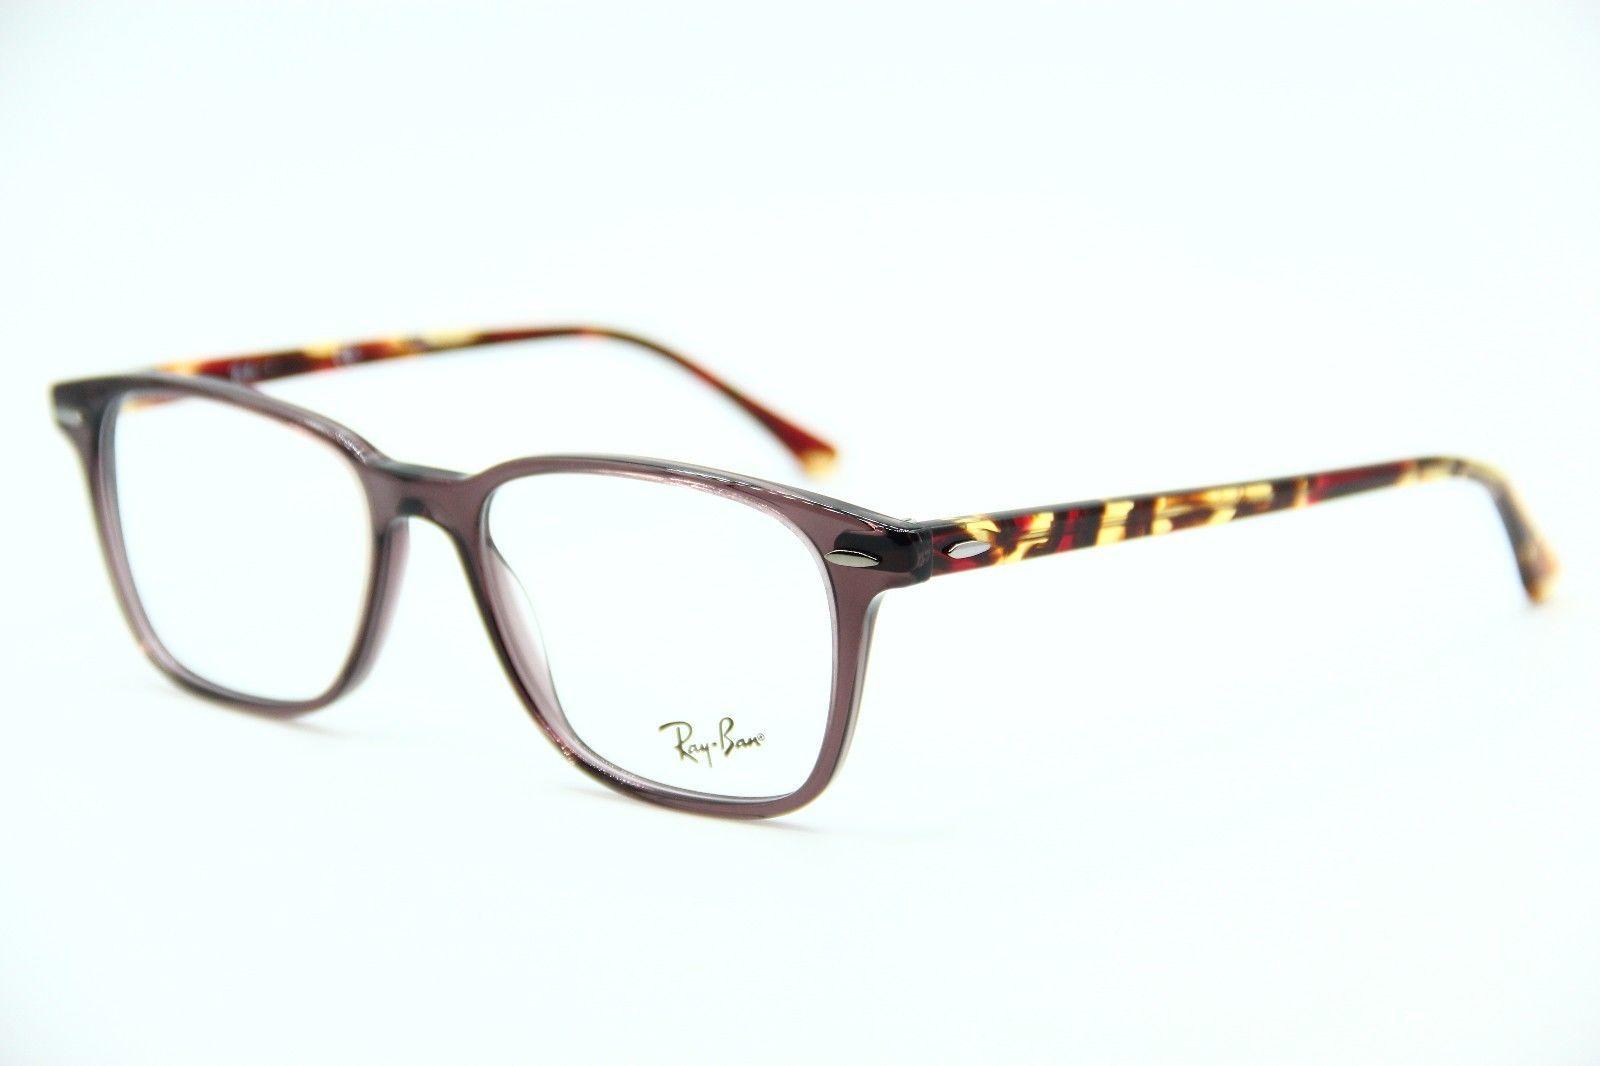 bdddd4ce730 New RAY-BAN Rb 7119 8023 Havana Eyeglasses and 50 similar items. 57